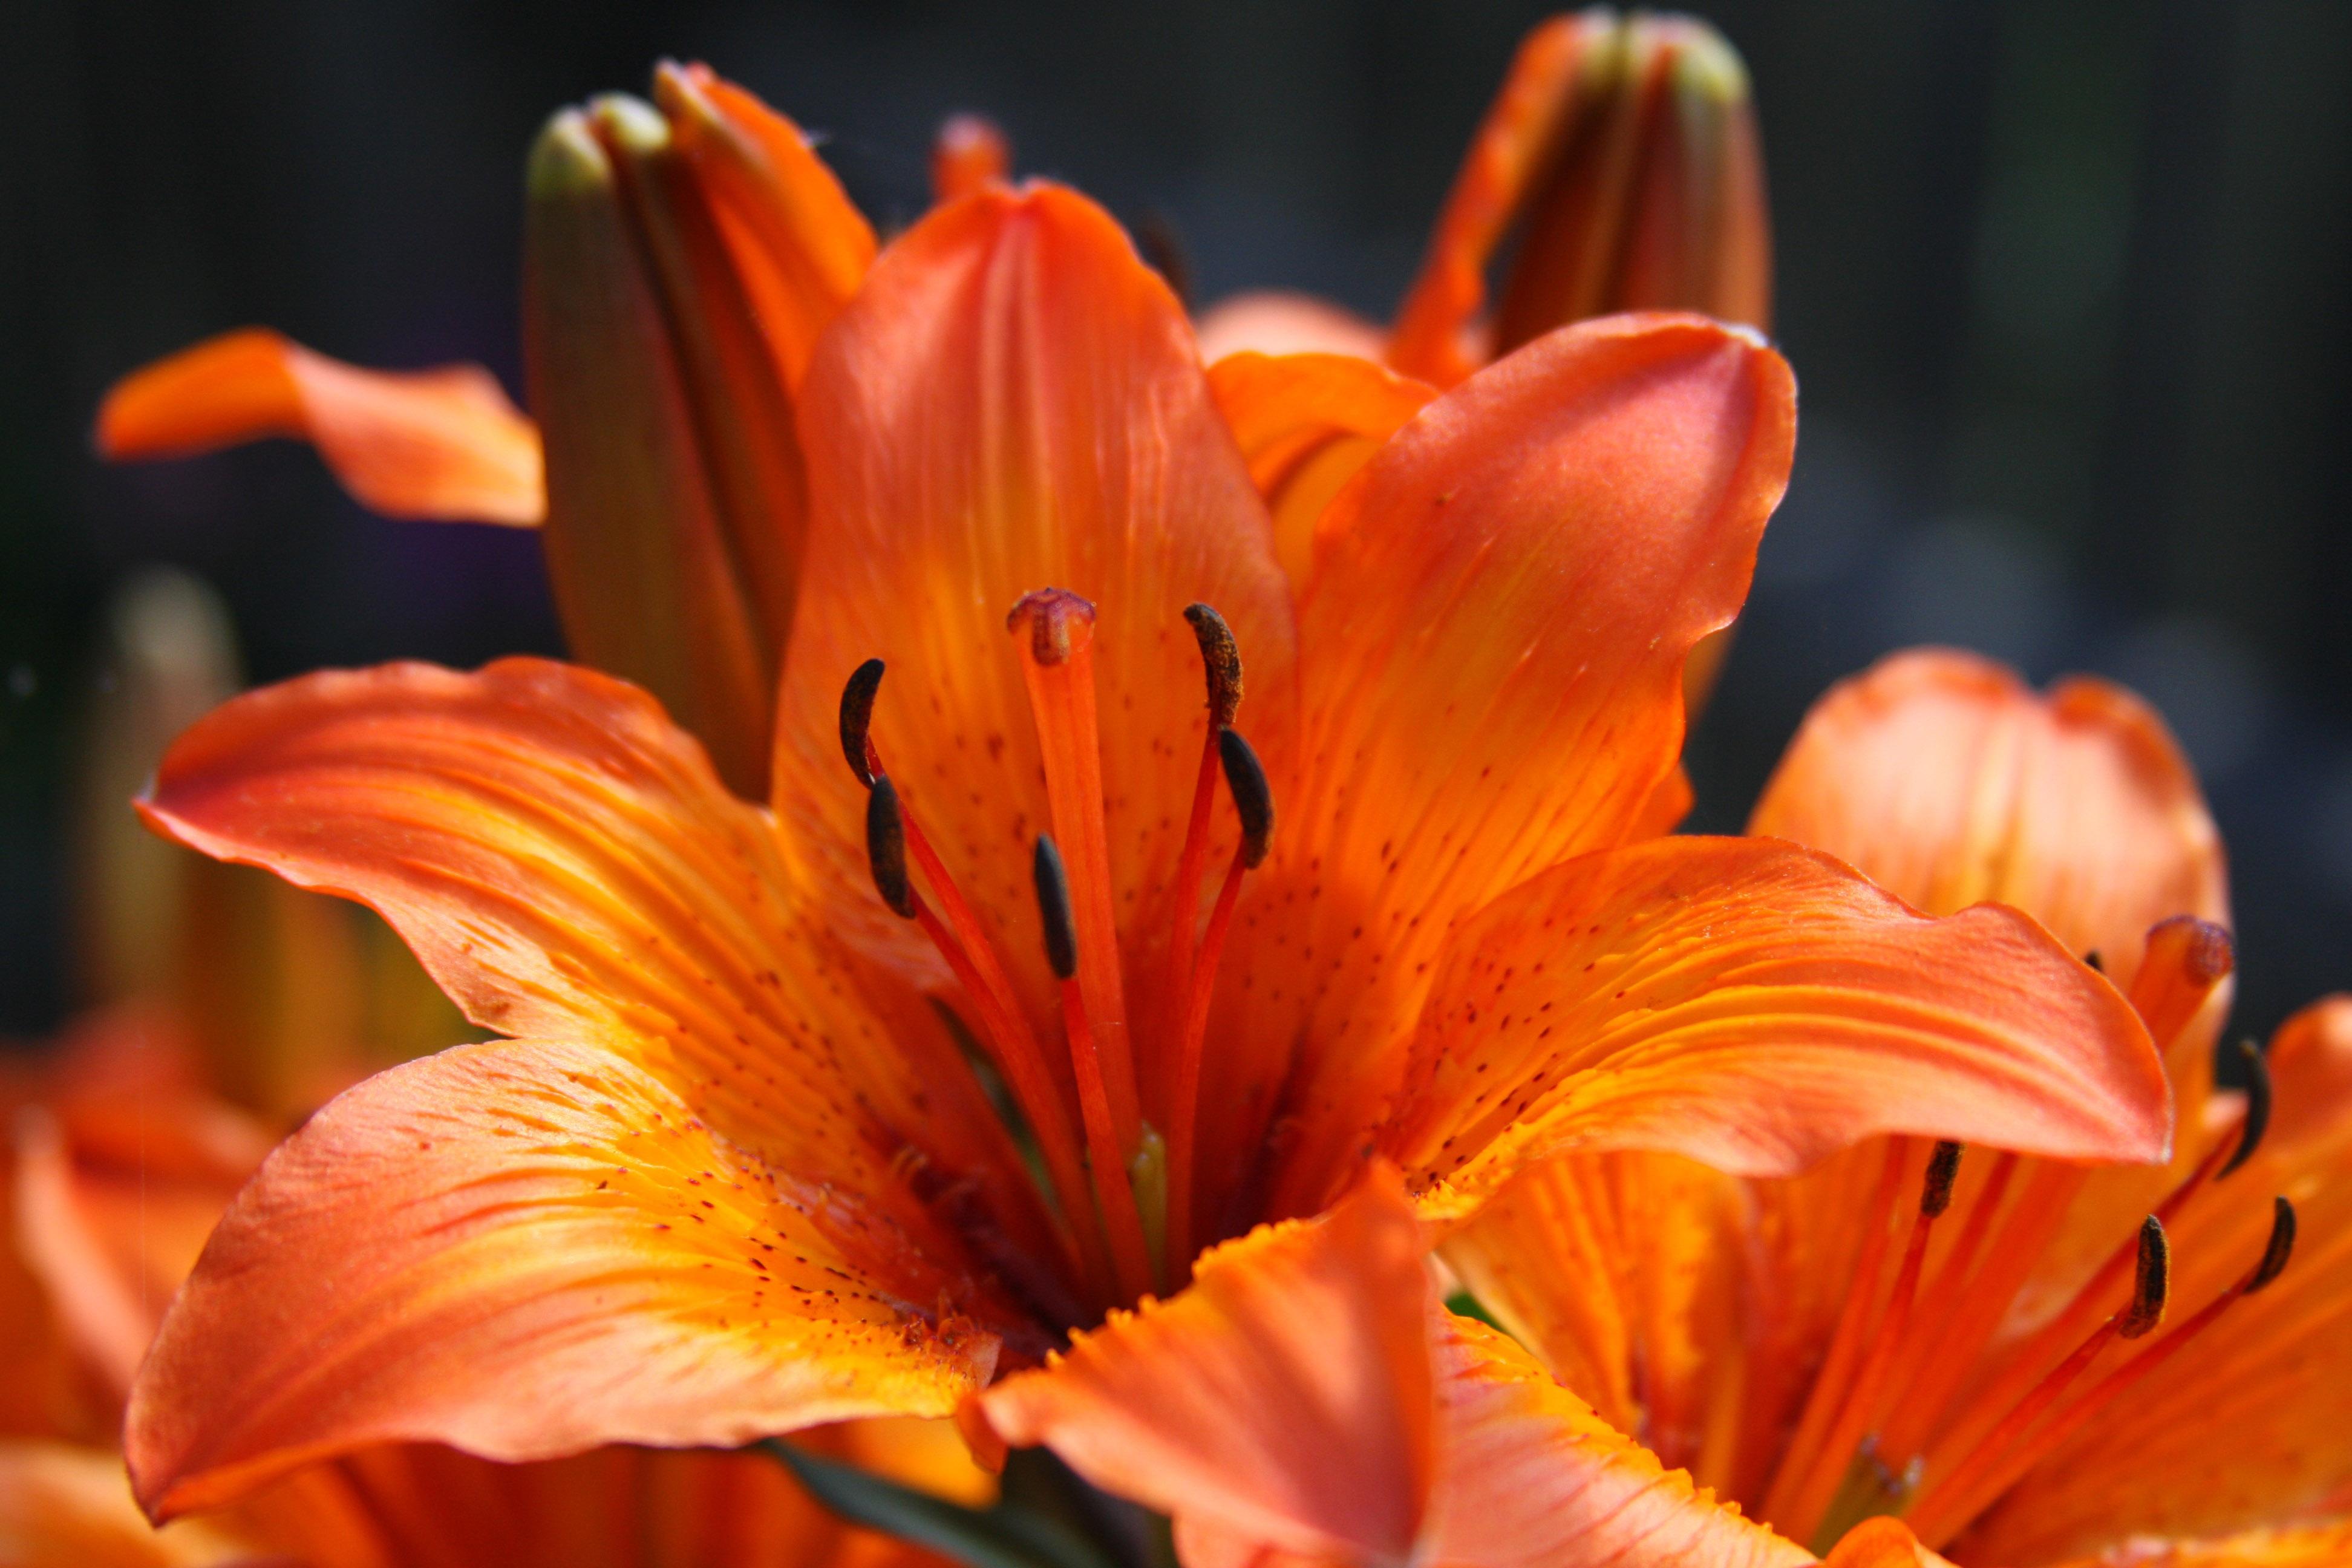 Beautiful orange lily flower image free stock photo public free photos plants photos beautiful orange lily flower izmirmasajfo